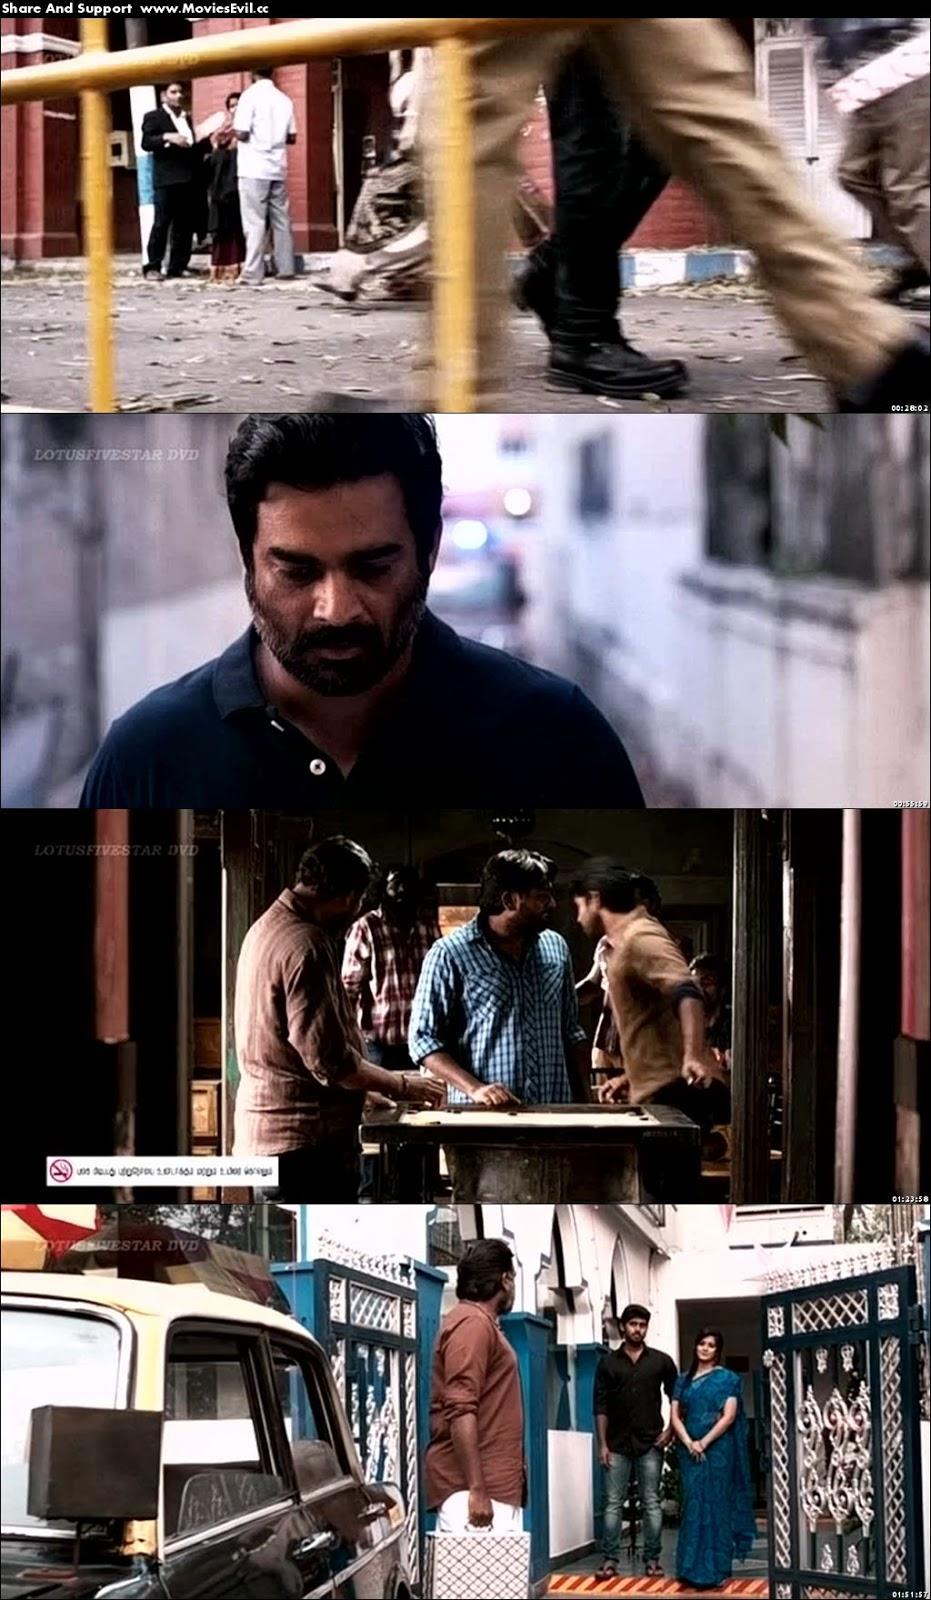 Vikram Vedha 2017 Tamil 720p DvDRip x264,Vikram Vedha 2017 full movie dual audio download,Vikram Vedha 2017 watch online hindiVikram Vedha 2017 300 mb download,Vikram Vedha 2017 direct link download